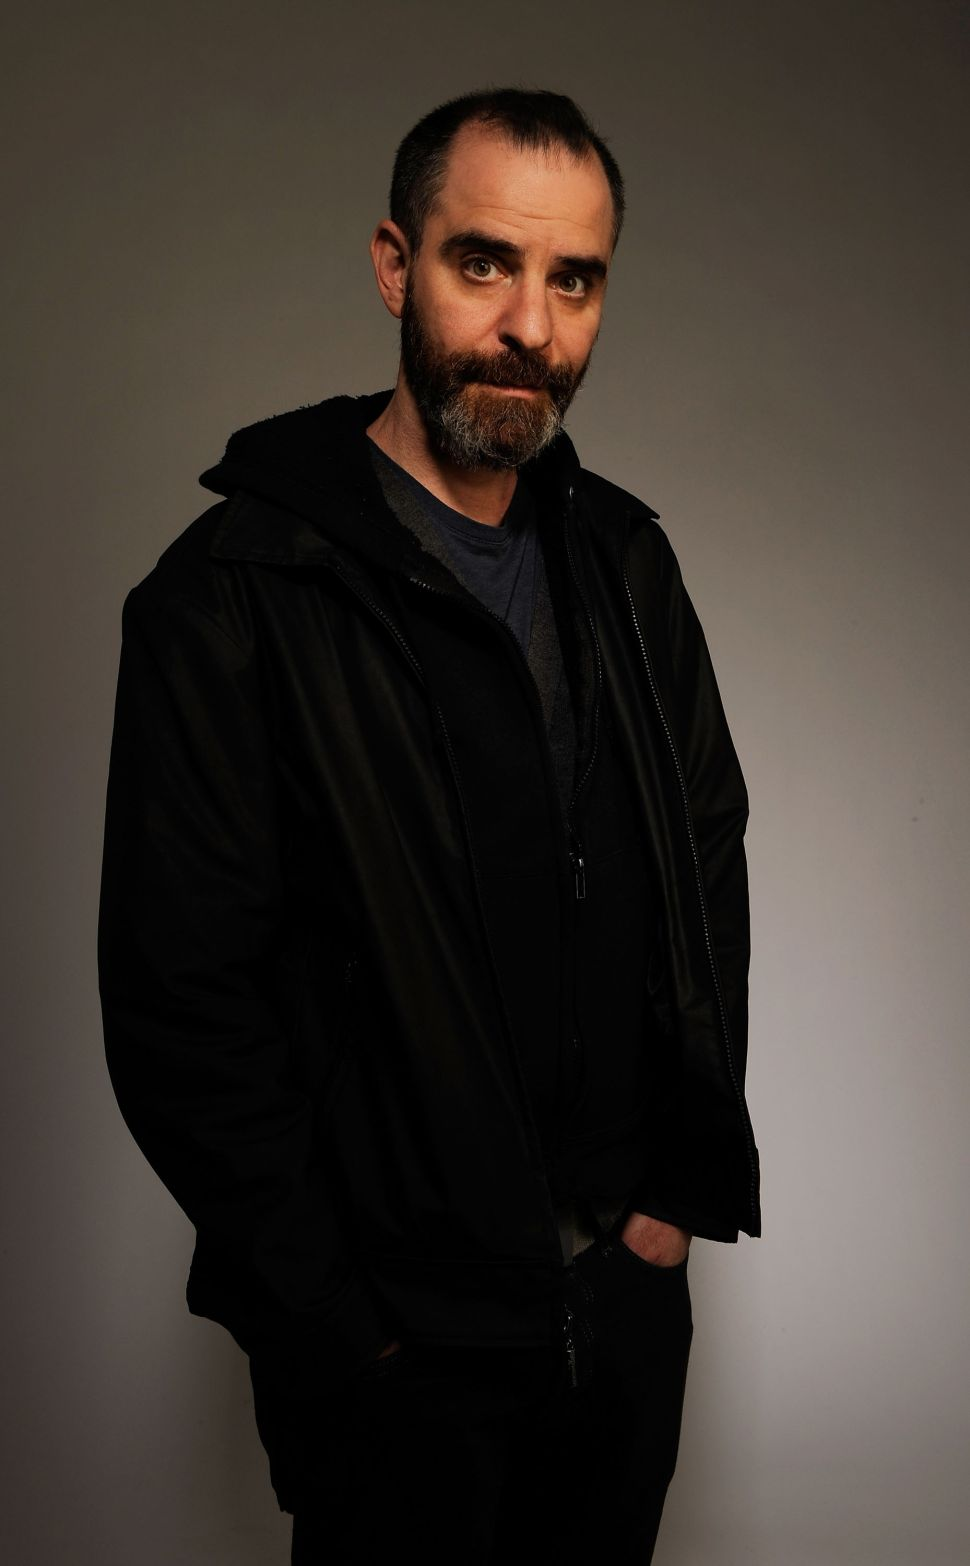 R.I.P. David Rakoff: 1964-2012